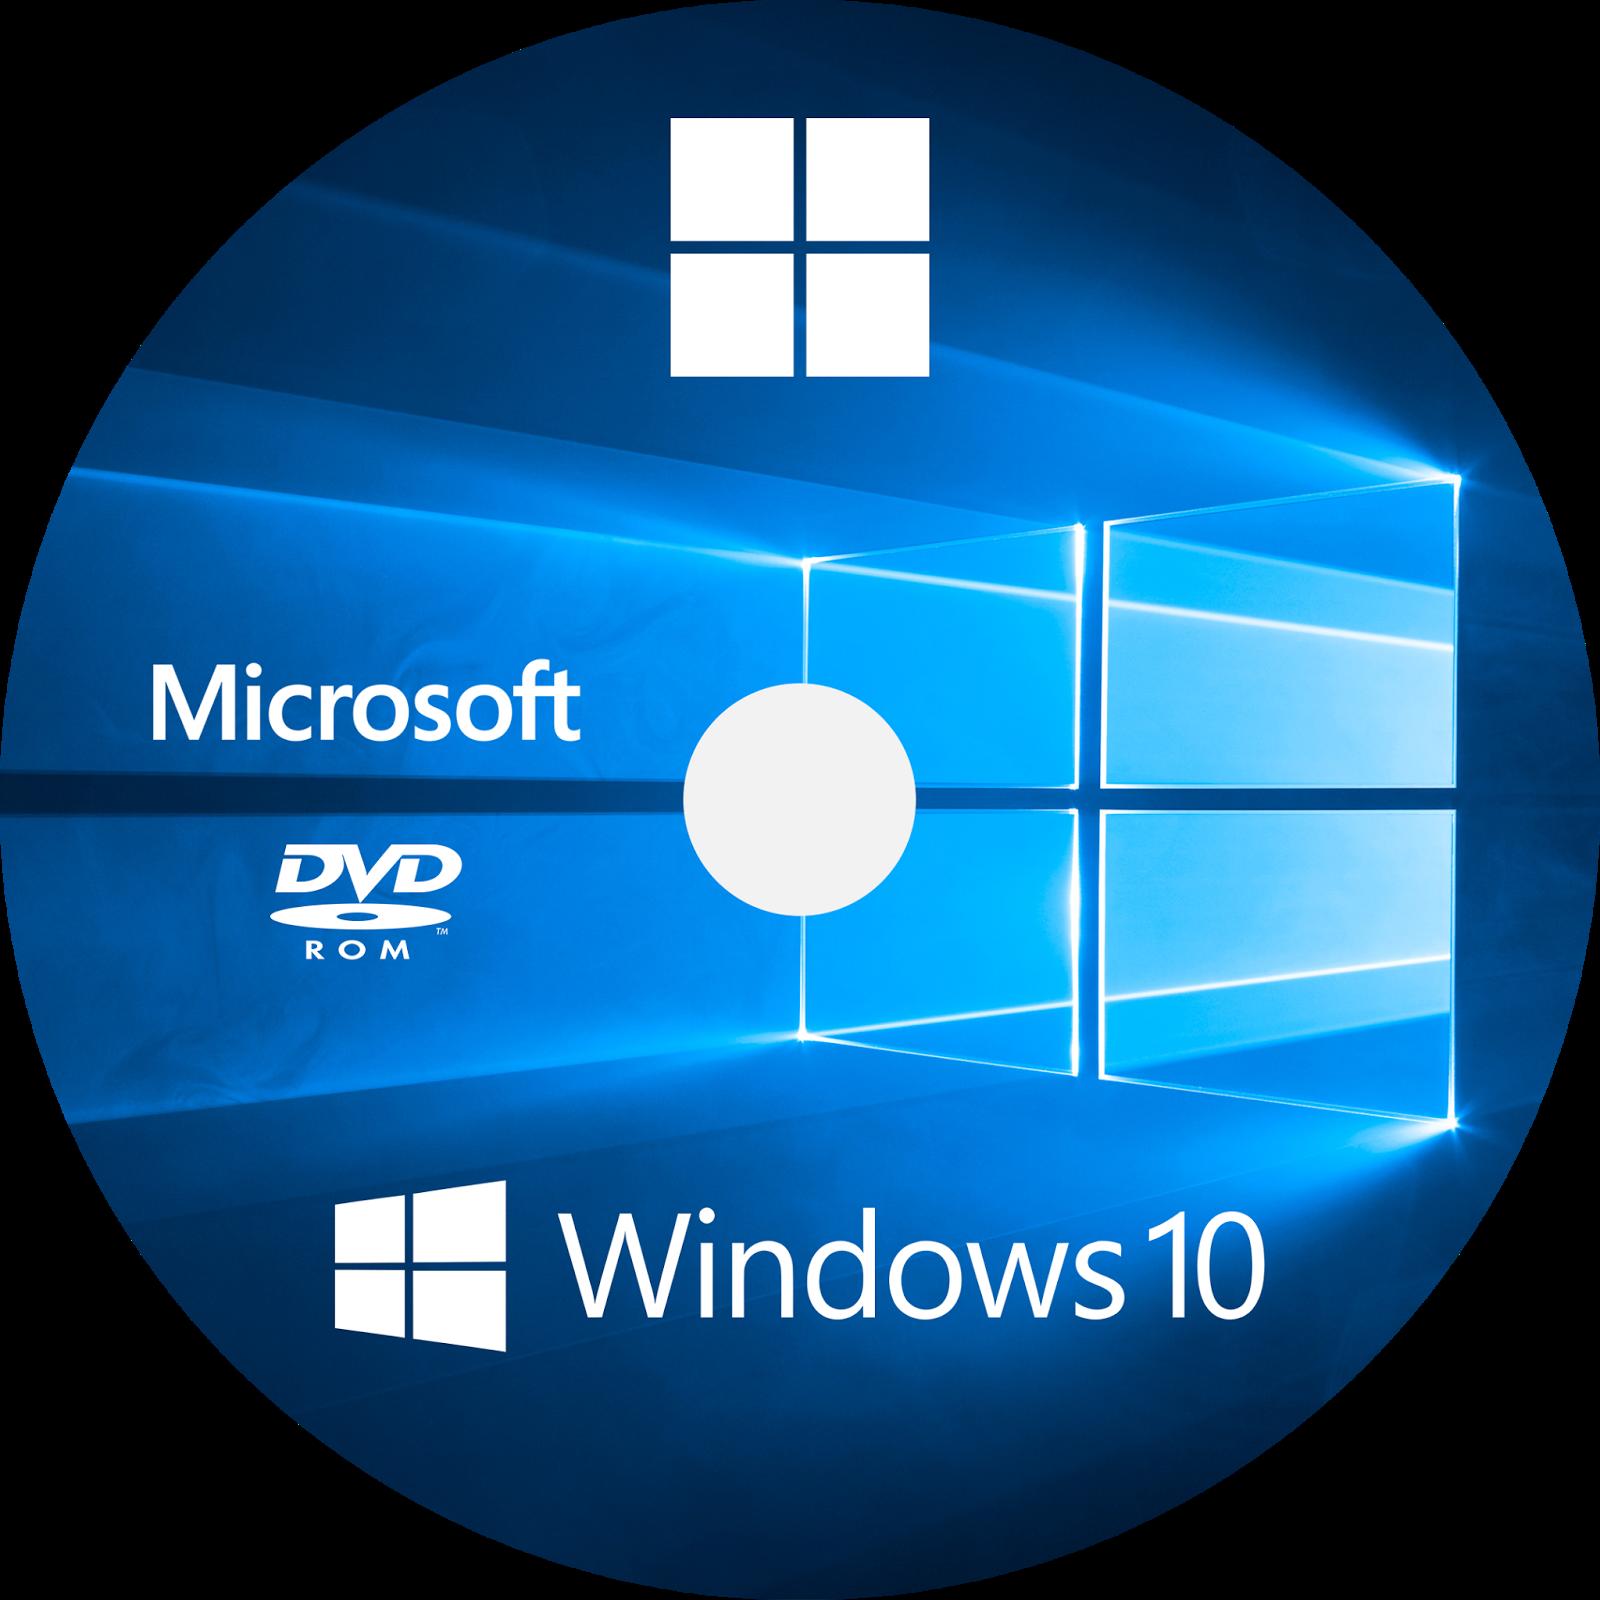 Macnix windows 10 cd dvd label dvd pinterest for Microsoft windows software